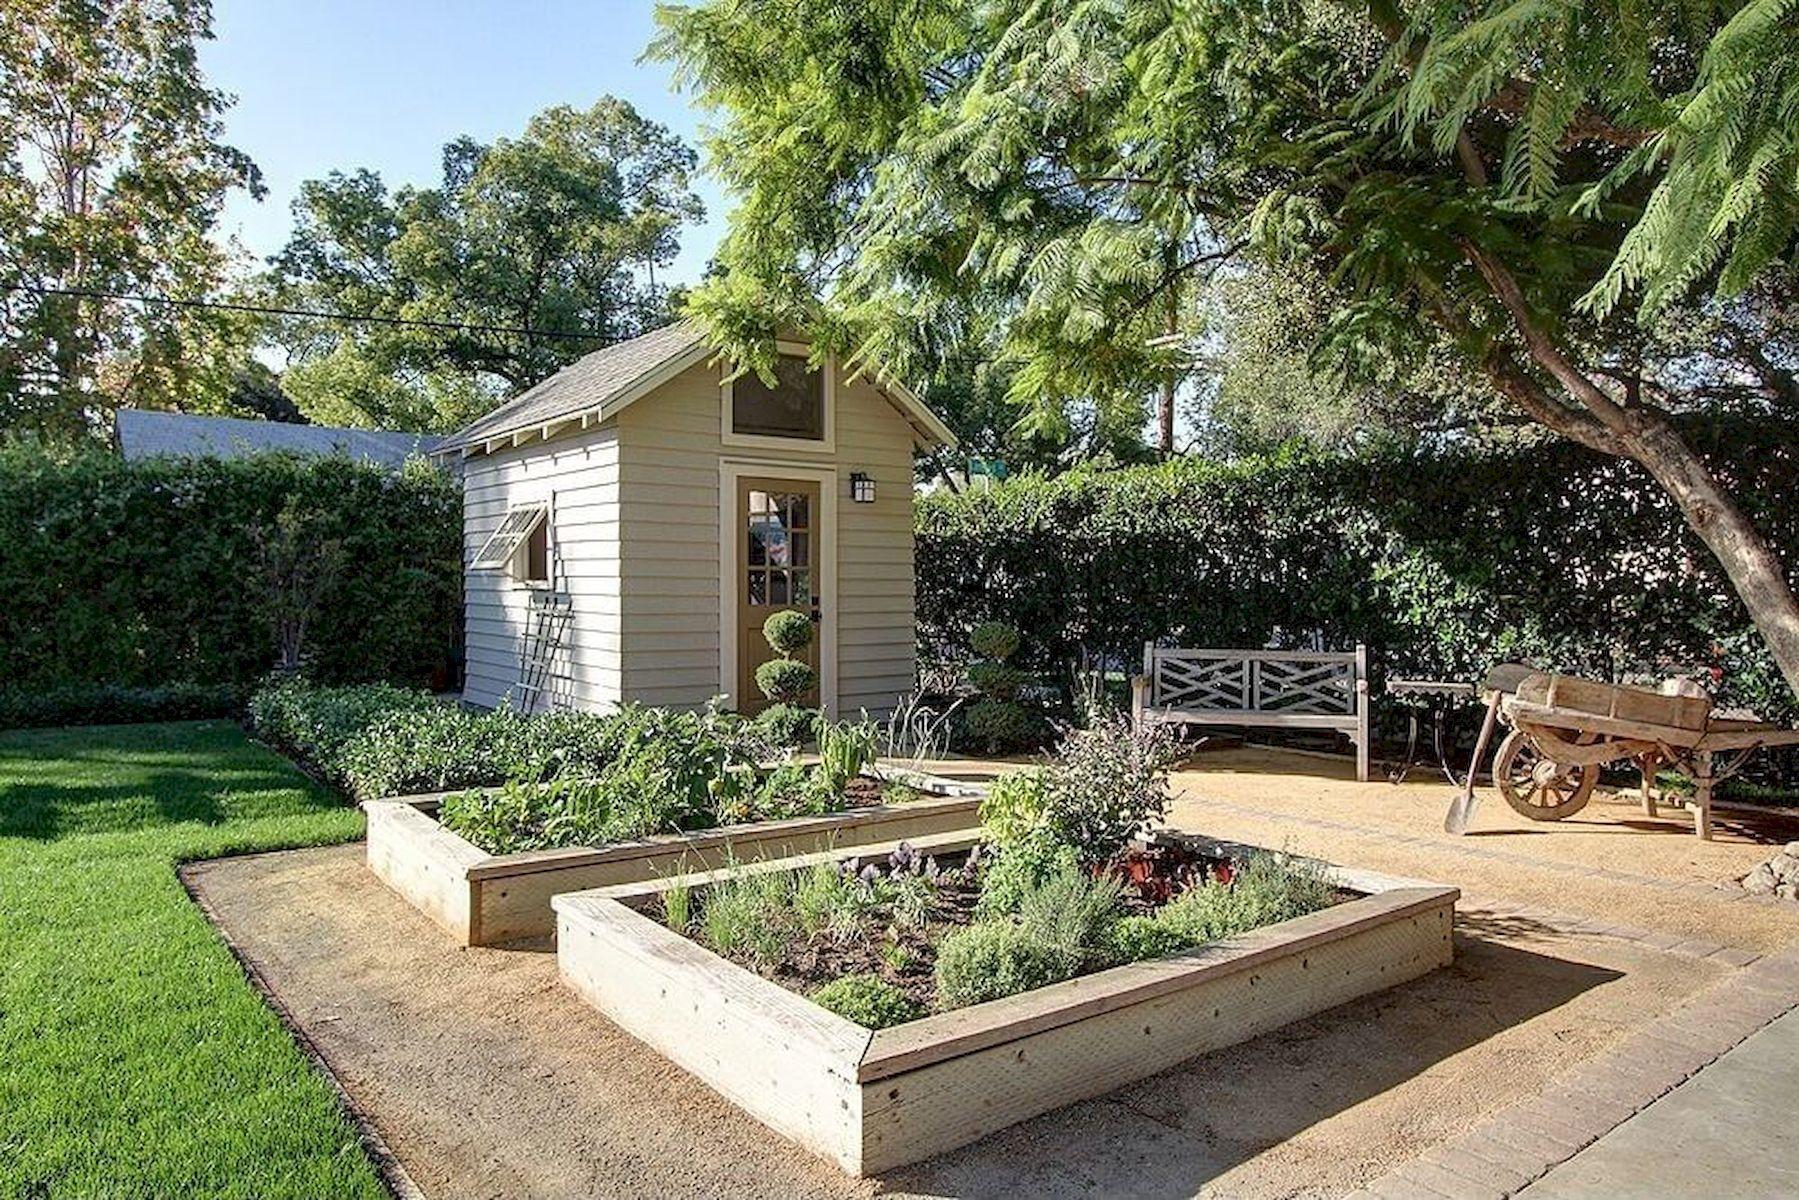 35 Stunning Vegetable Backyard For Garden Ideas 35 Stunning Vegetable Backyard For Garden Ideas